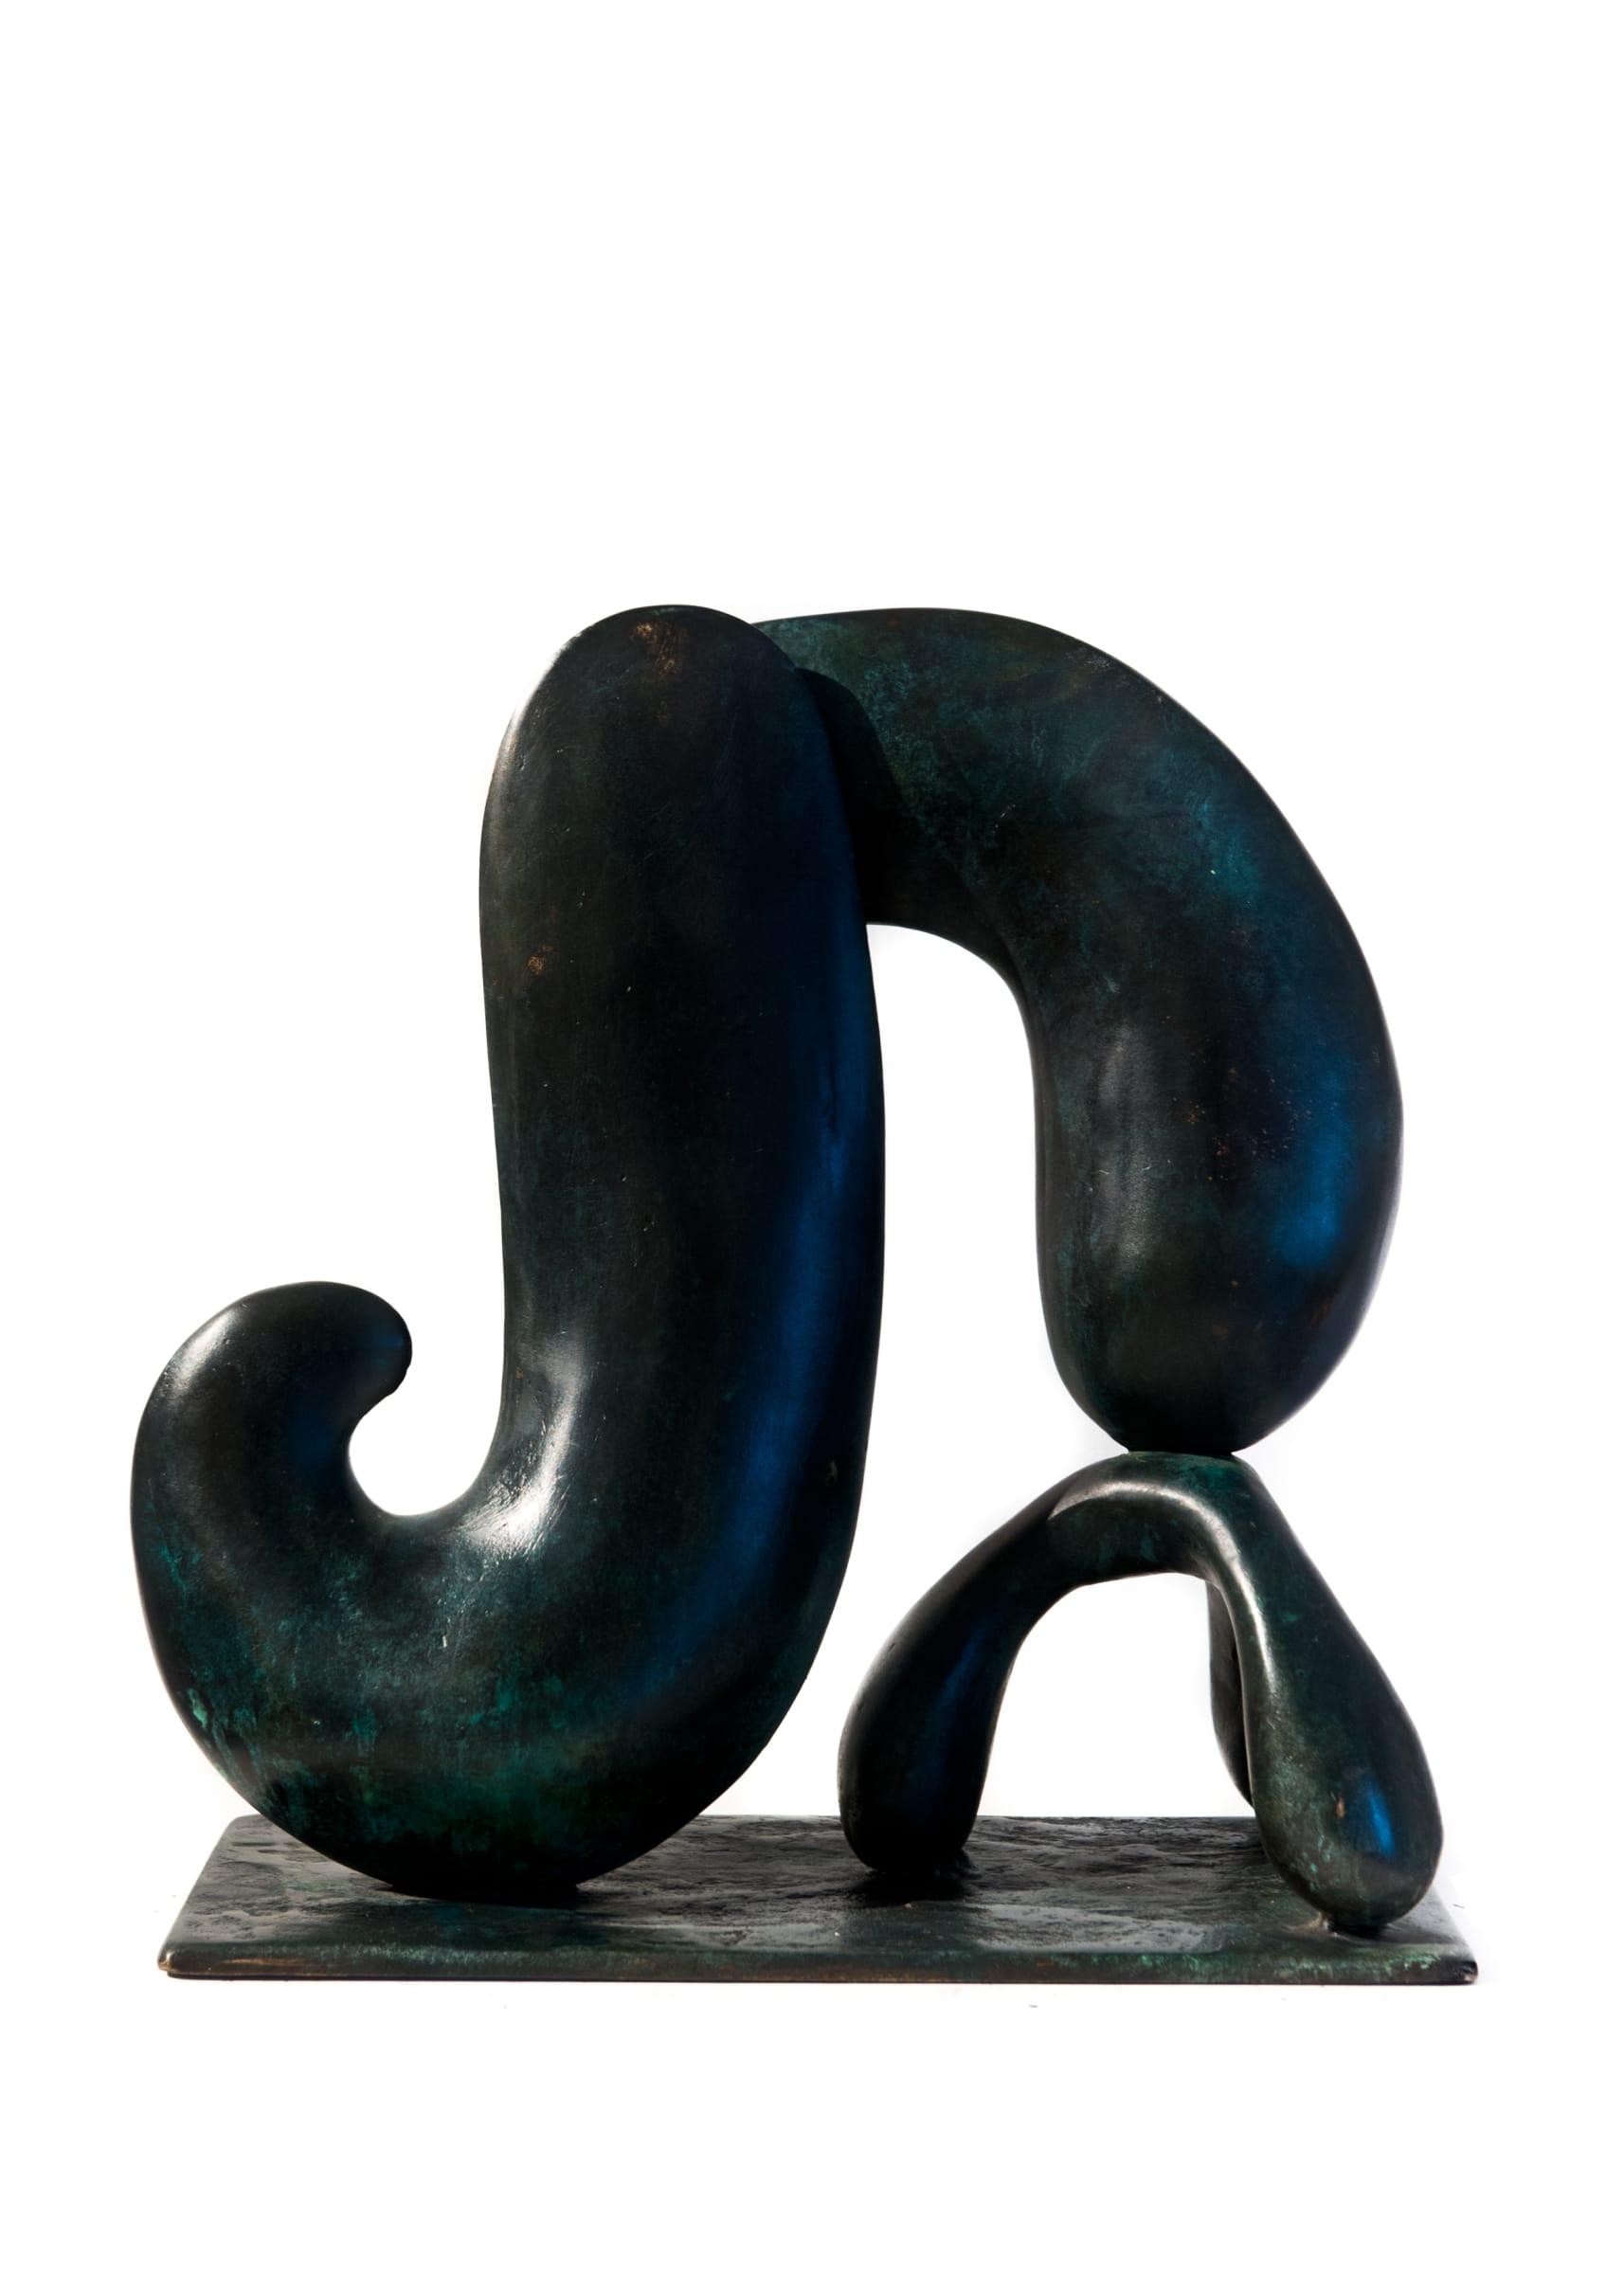 <span class=&#34;link fancybox-details-link&#34;><a href=&#34;/exhibitions/59/works/artworks4982/&#34;>View Detail Page</a></span><div class=&#34;signed_and_dated&#34;>Signed and dated on base</div> <div class=&#34;medium&#34;>Cast Patinated Bronze</div> <div class=&#34;dimensions&#34;>14.6 x 13.4 x 6.3 in<br />37 x 34 x 16 cm</div> <div class=&#34;edition_details&#34;>#1/2</div>